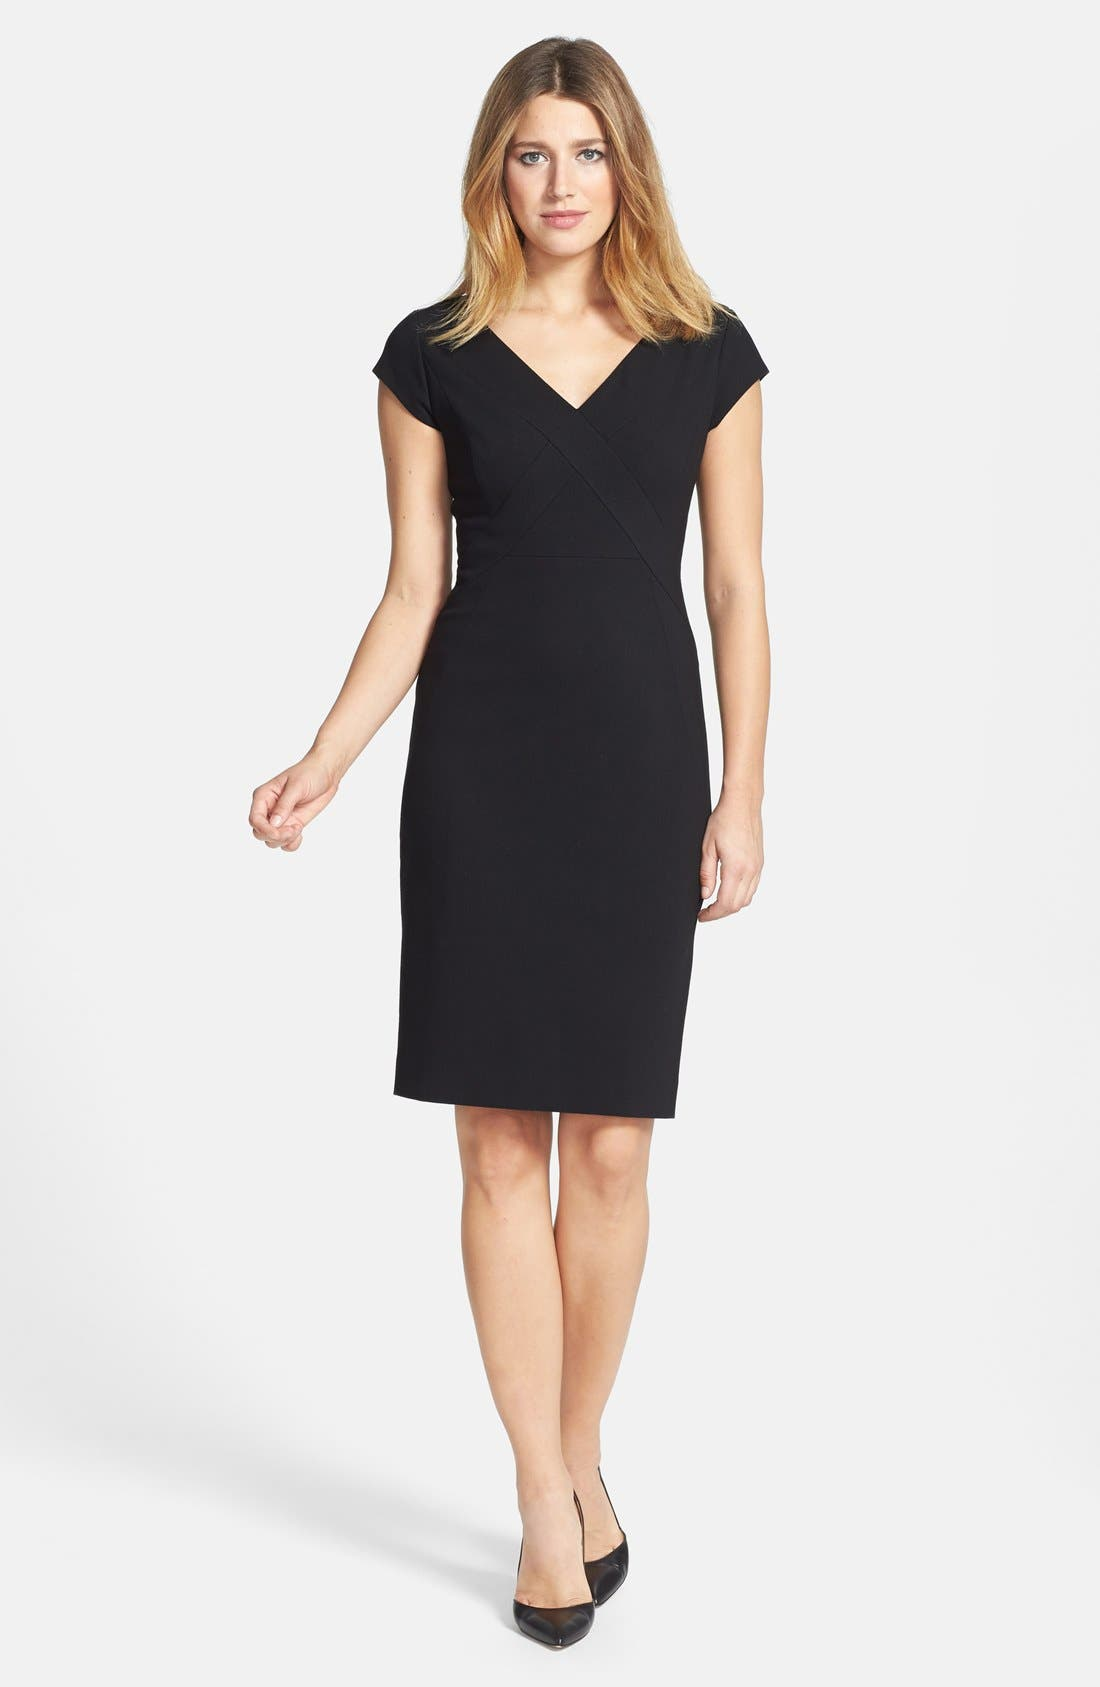 Main Image - Classiques Entier® Ponte Knit V-Neck Sheath Dress (Regular & Petite)